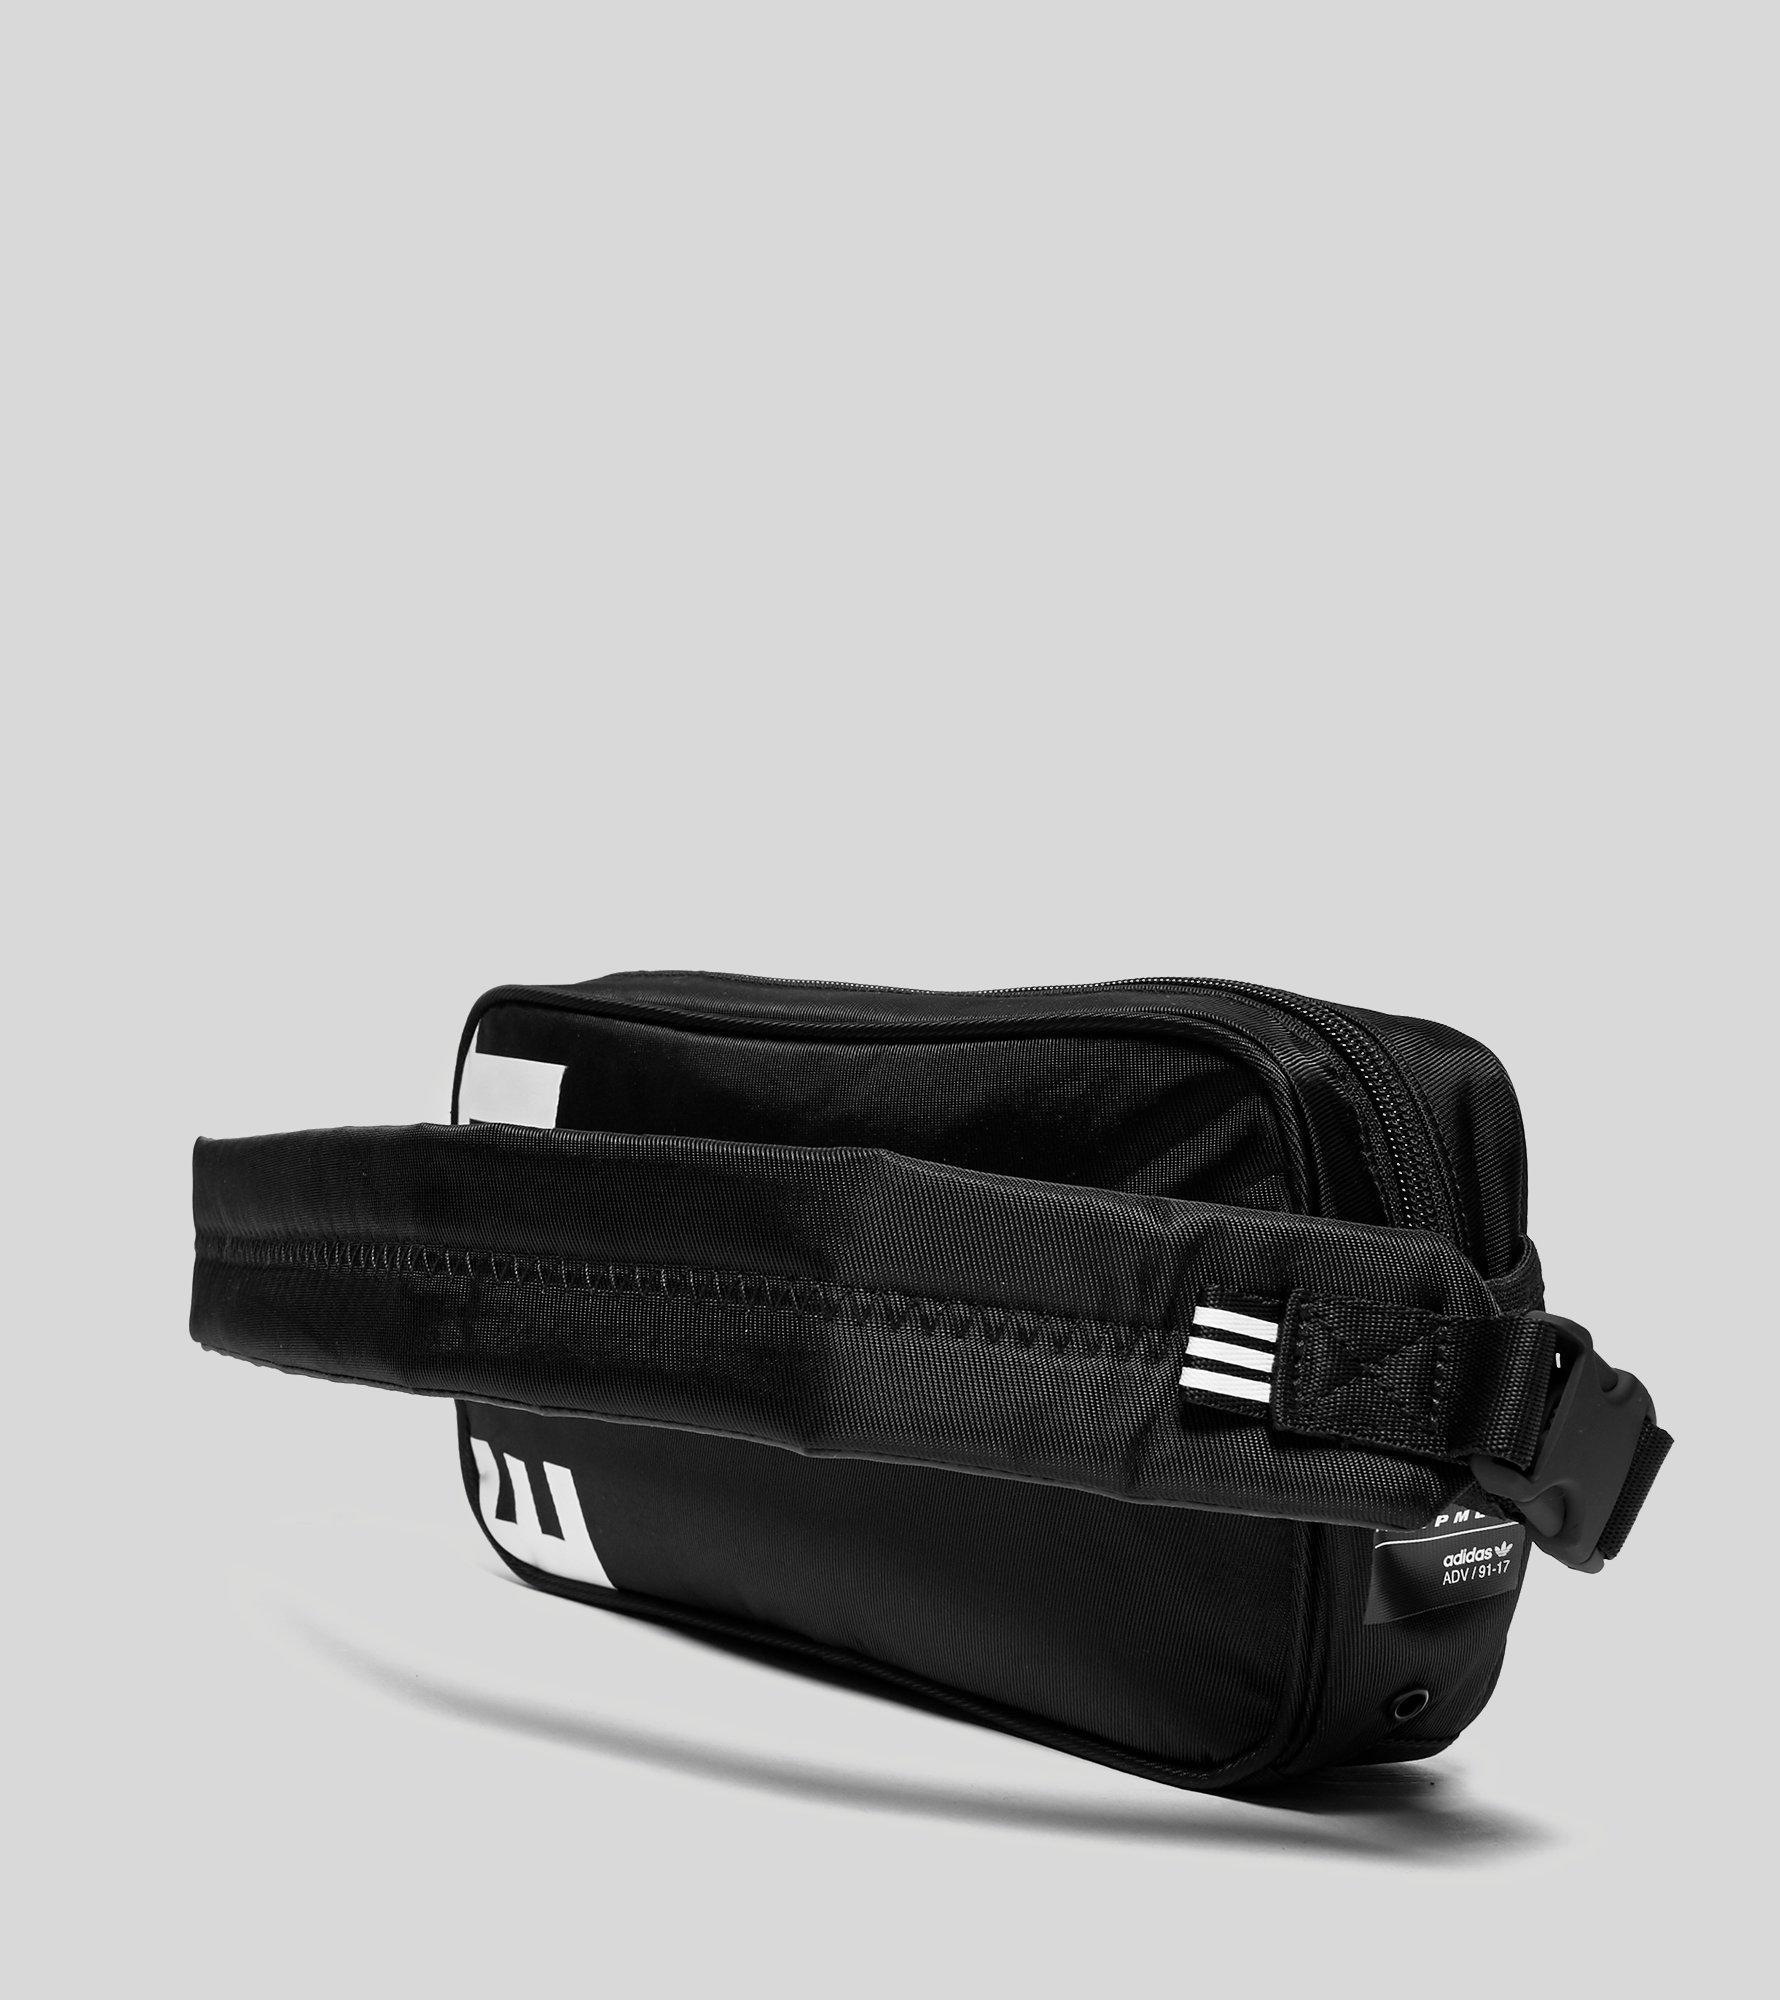 6ec362b5f5 Lyst - Adidas Eqt Cross Body Bag in Black for Men